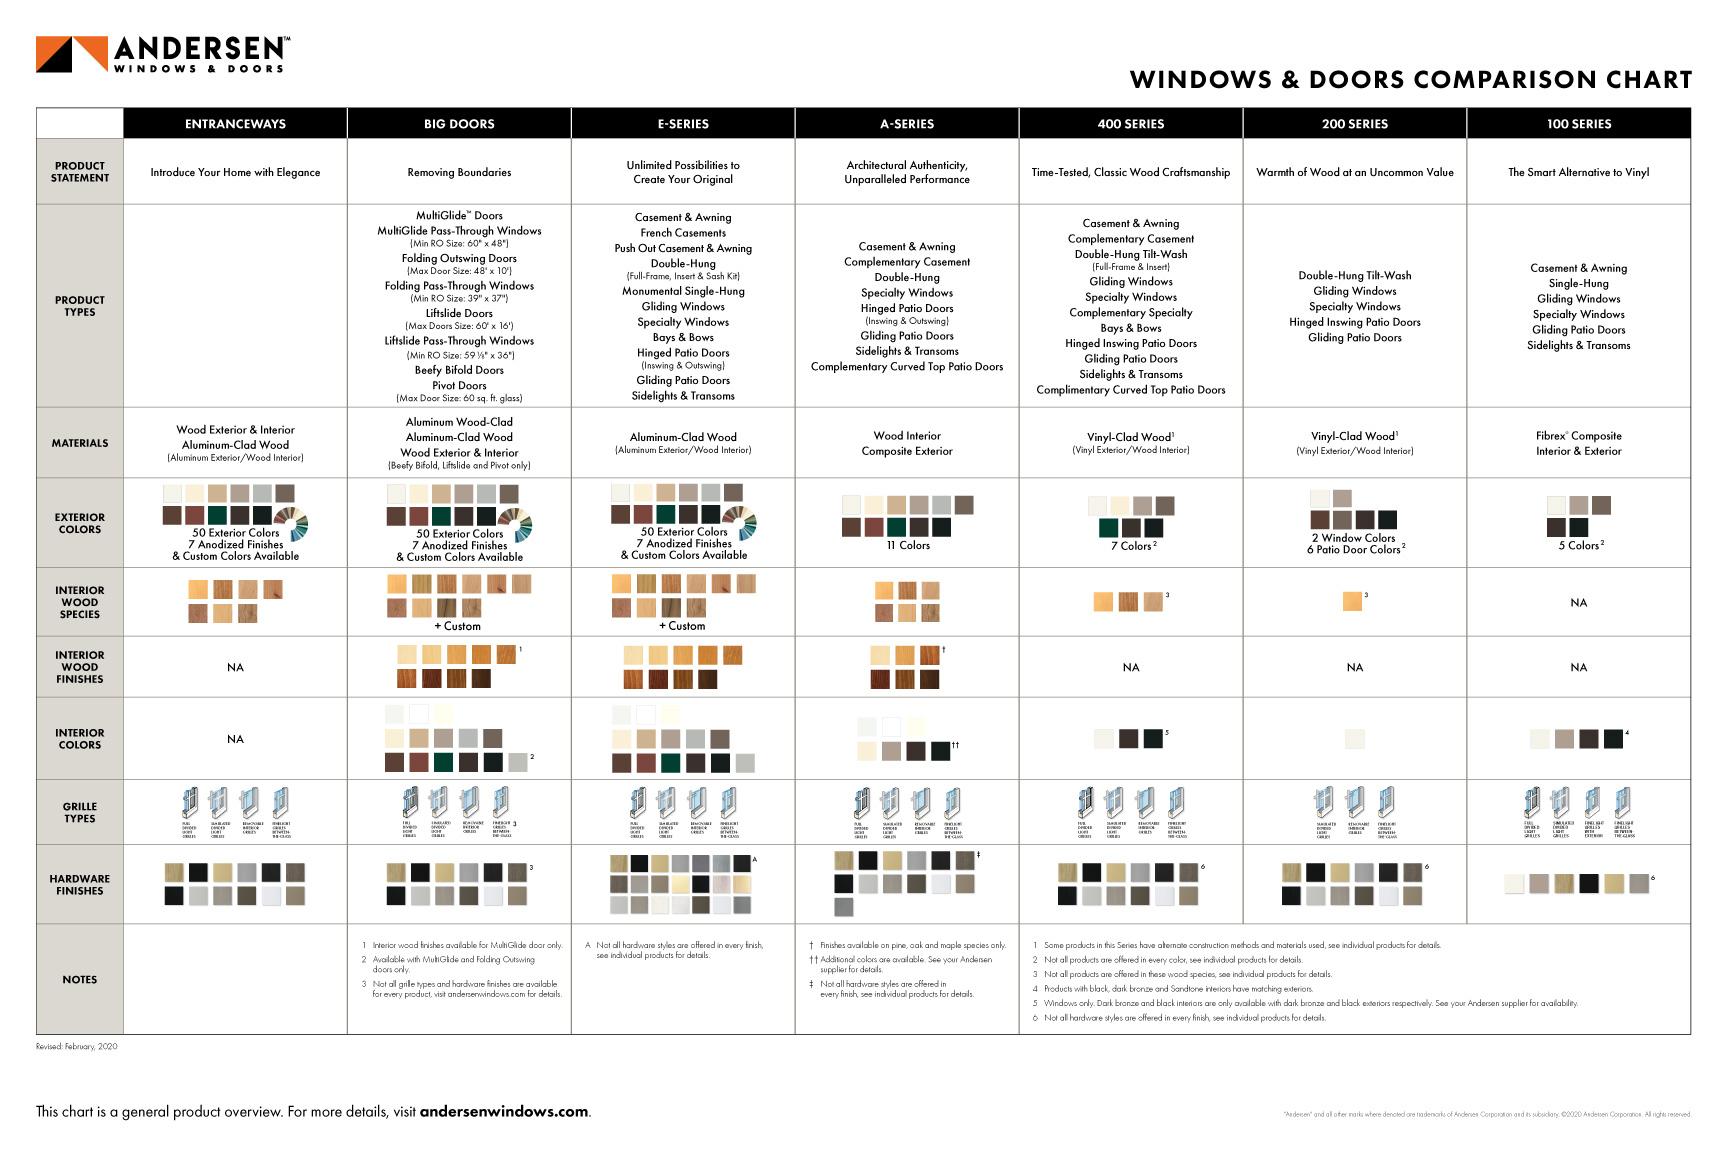 Andersen-Comparison-Chart